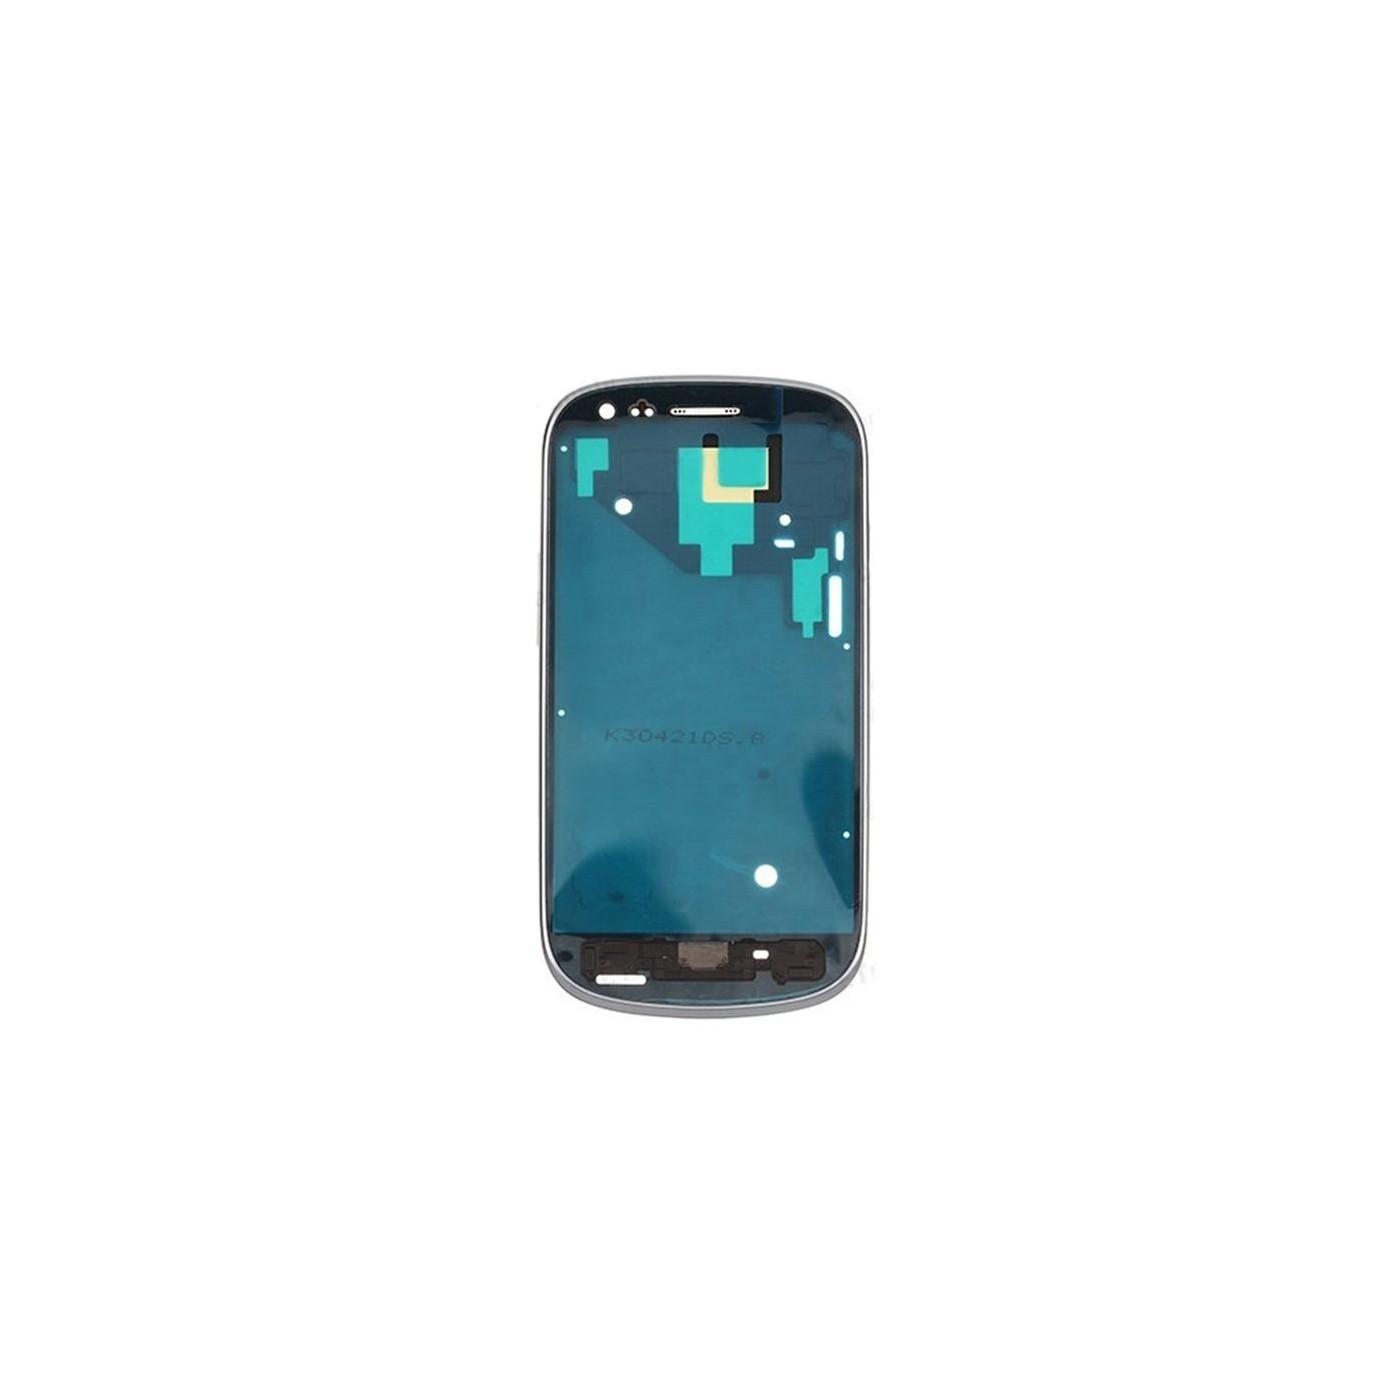 Cadre Cadre Coque Samsung Galaxy S3 mini I8190 blanc Cadre central